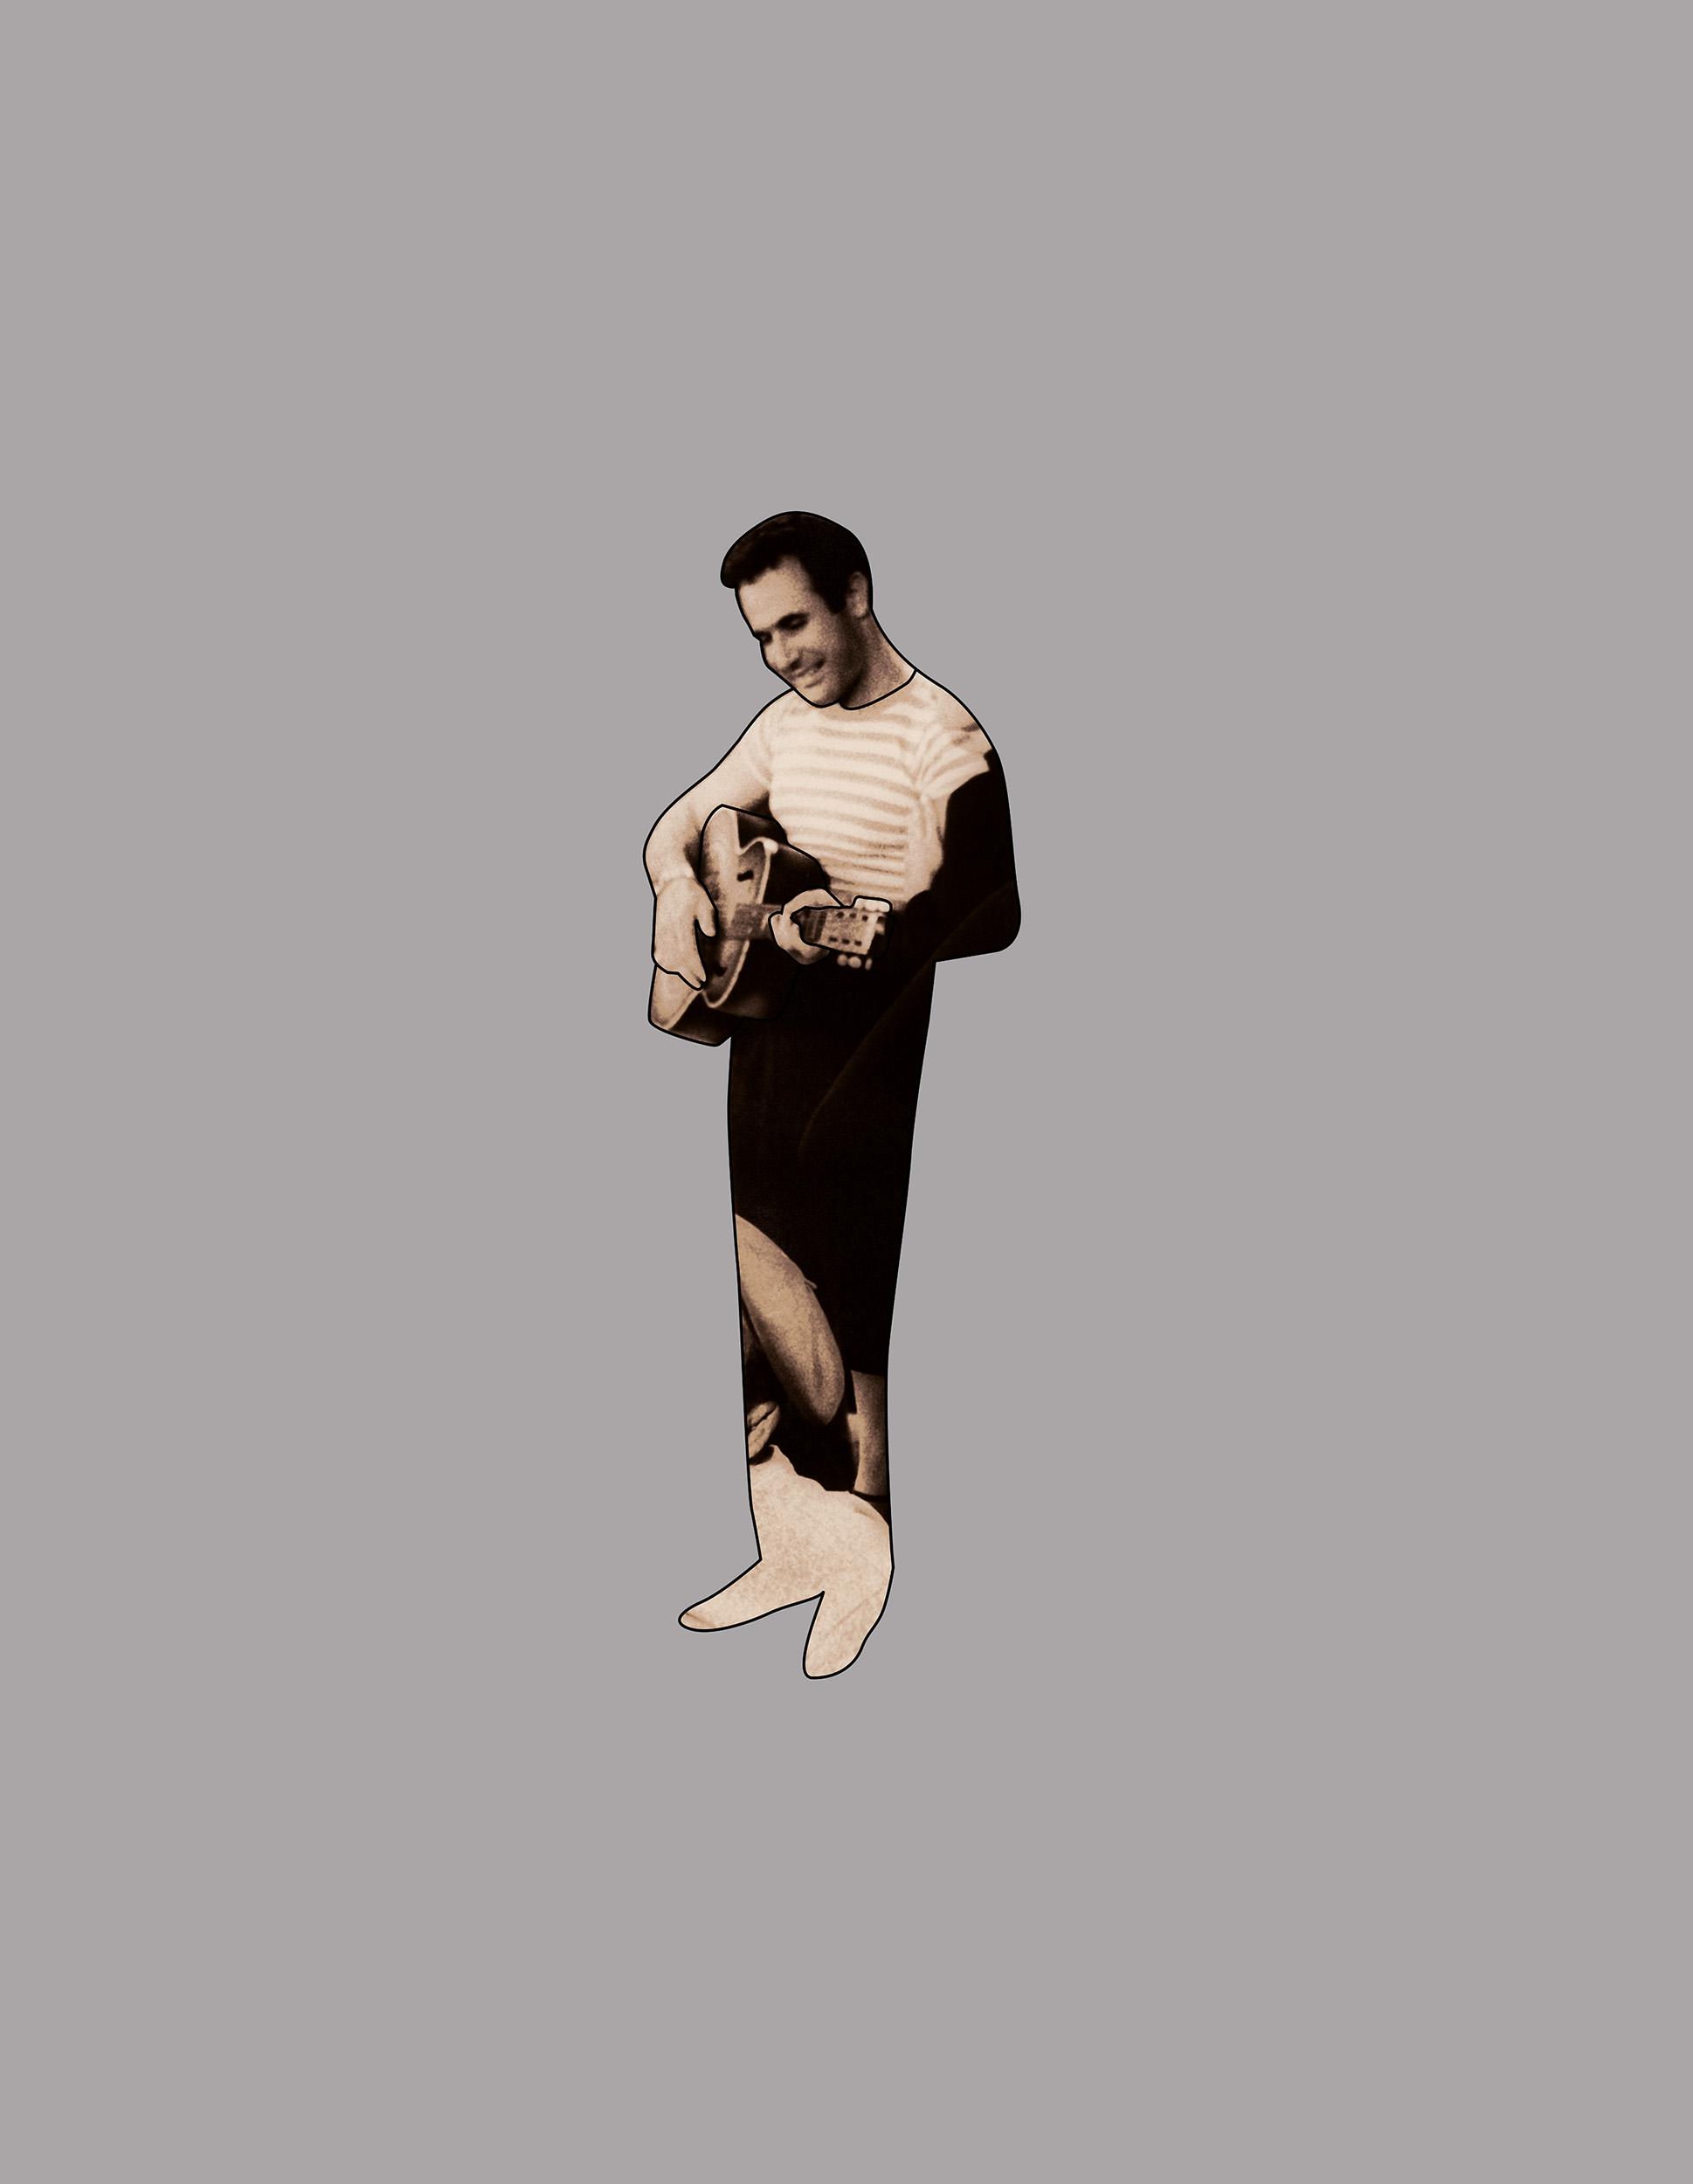 Guitar Guy  2005, colour photograph,76 x 58 cm / 30 x 23 in.